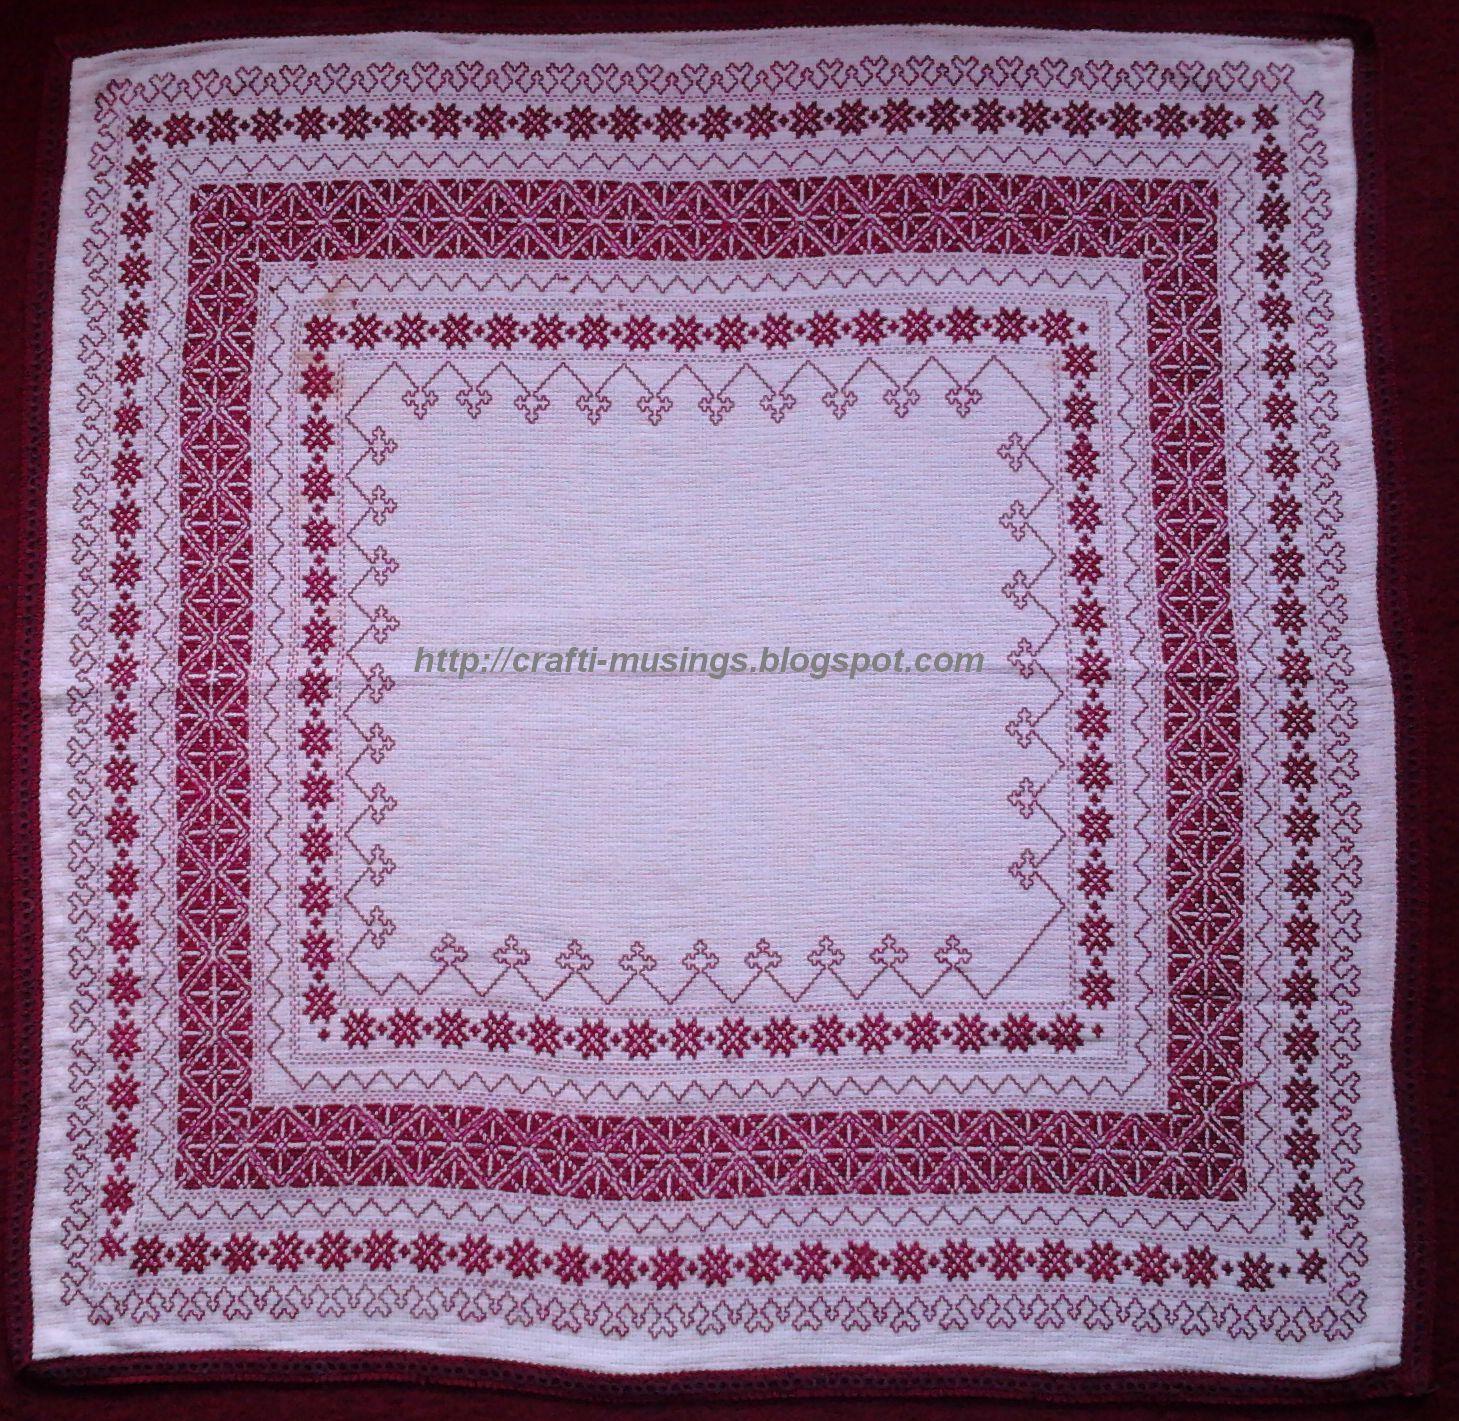 Crafti Musings Cross Stitch Norwegian Motif My Best One Yet